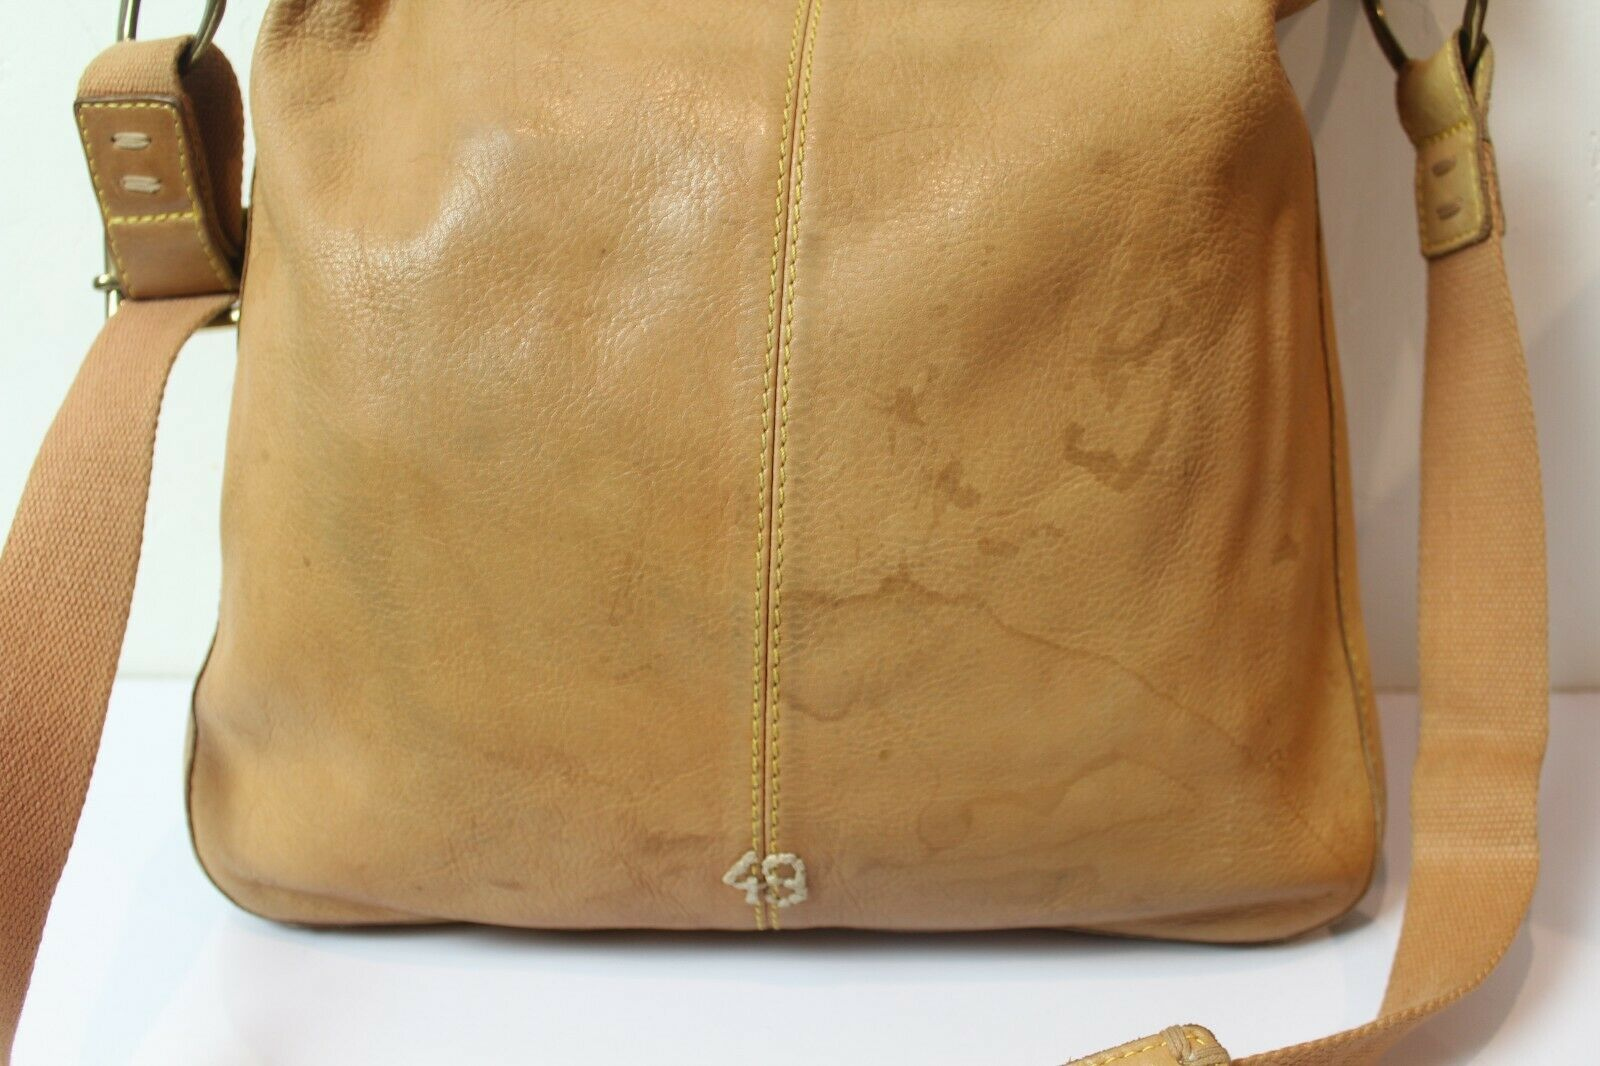 49 Square Miles Tan Leather Bag Hobo Large Bag - image 3